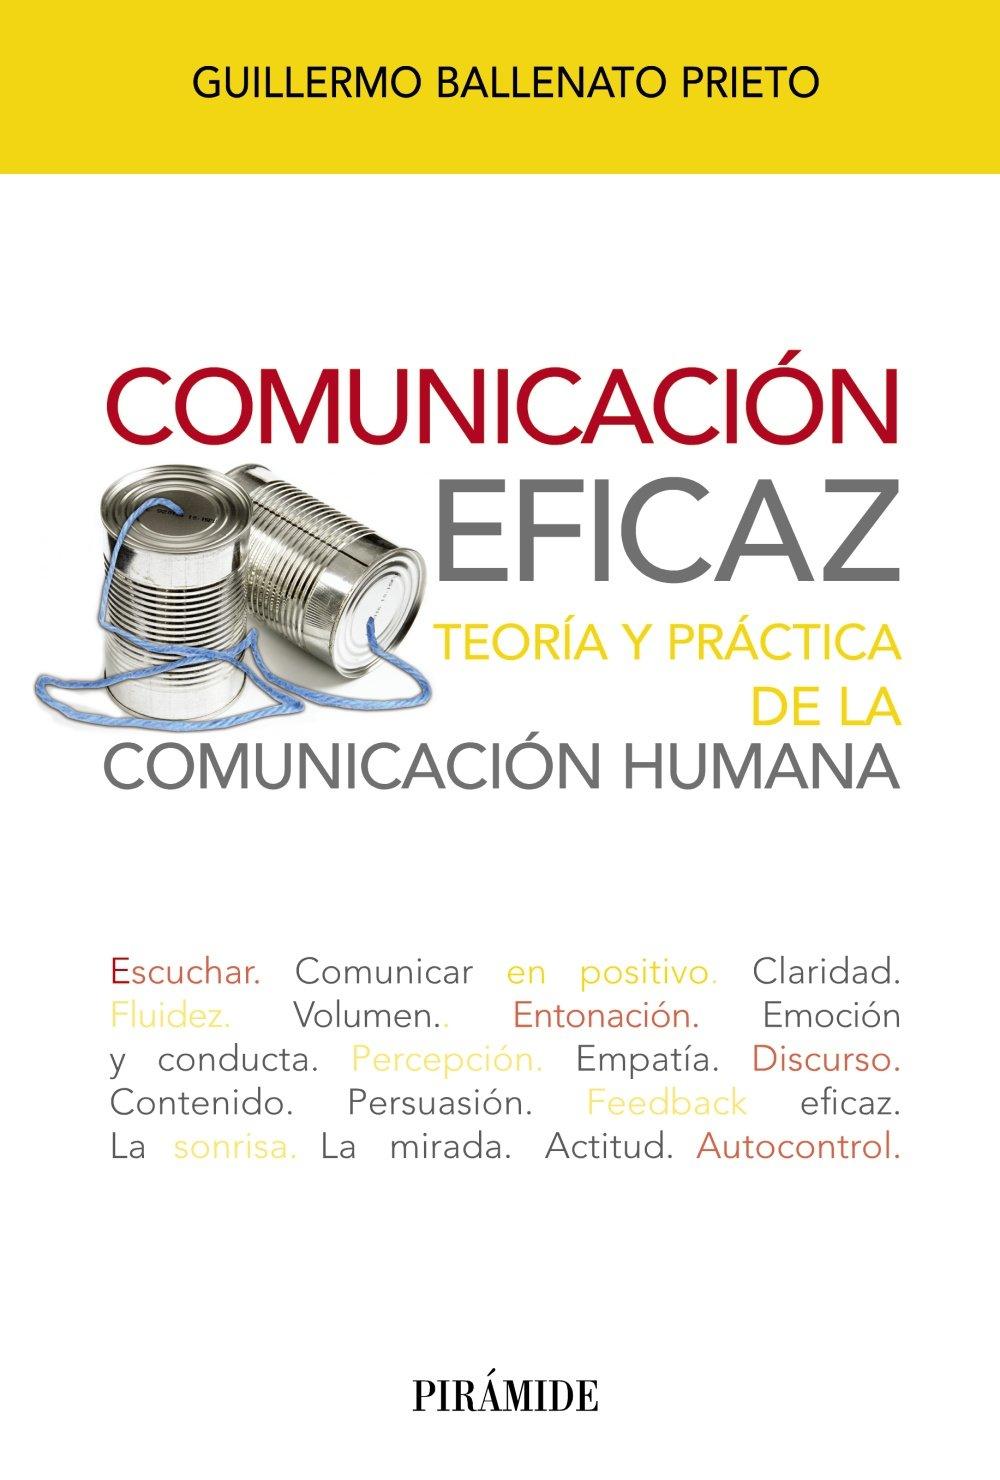 Of pdf theories human communication